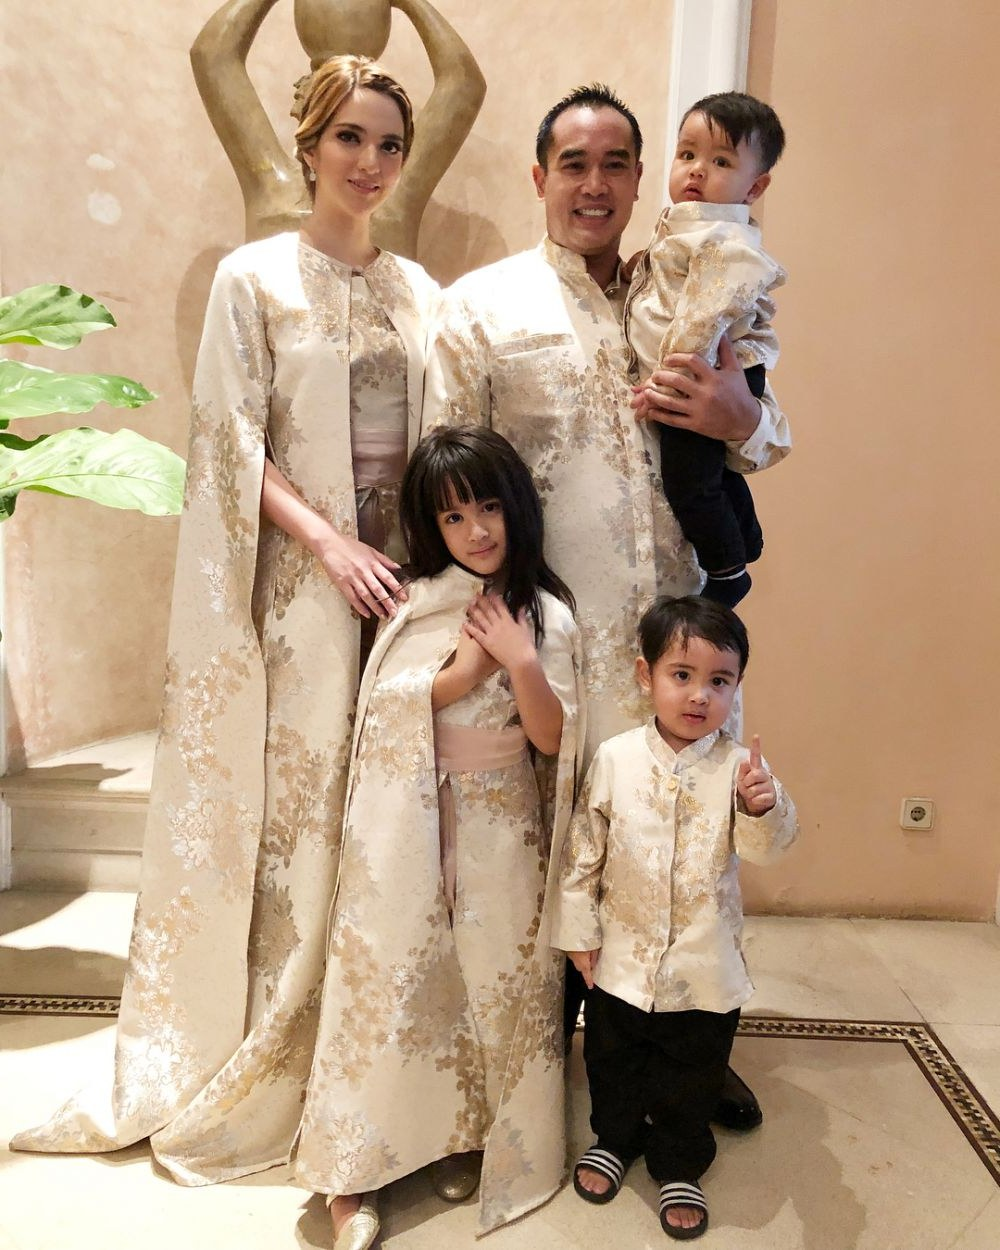 Model Baju Lebaran Keluarga Sby Y7du Potret 16 Seleb Pakai Baju Kembaran Saat Lebaran Kompak Abis